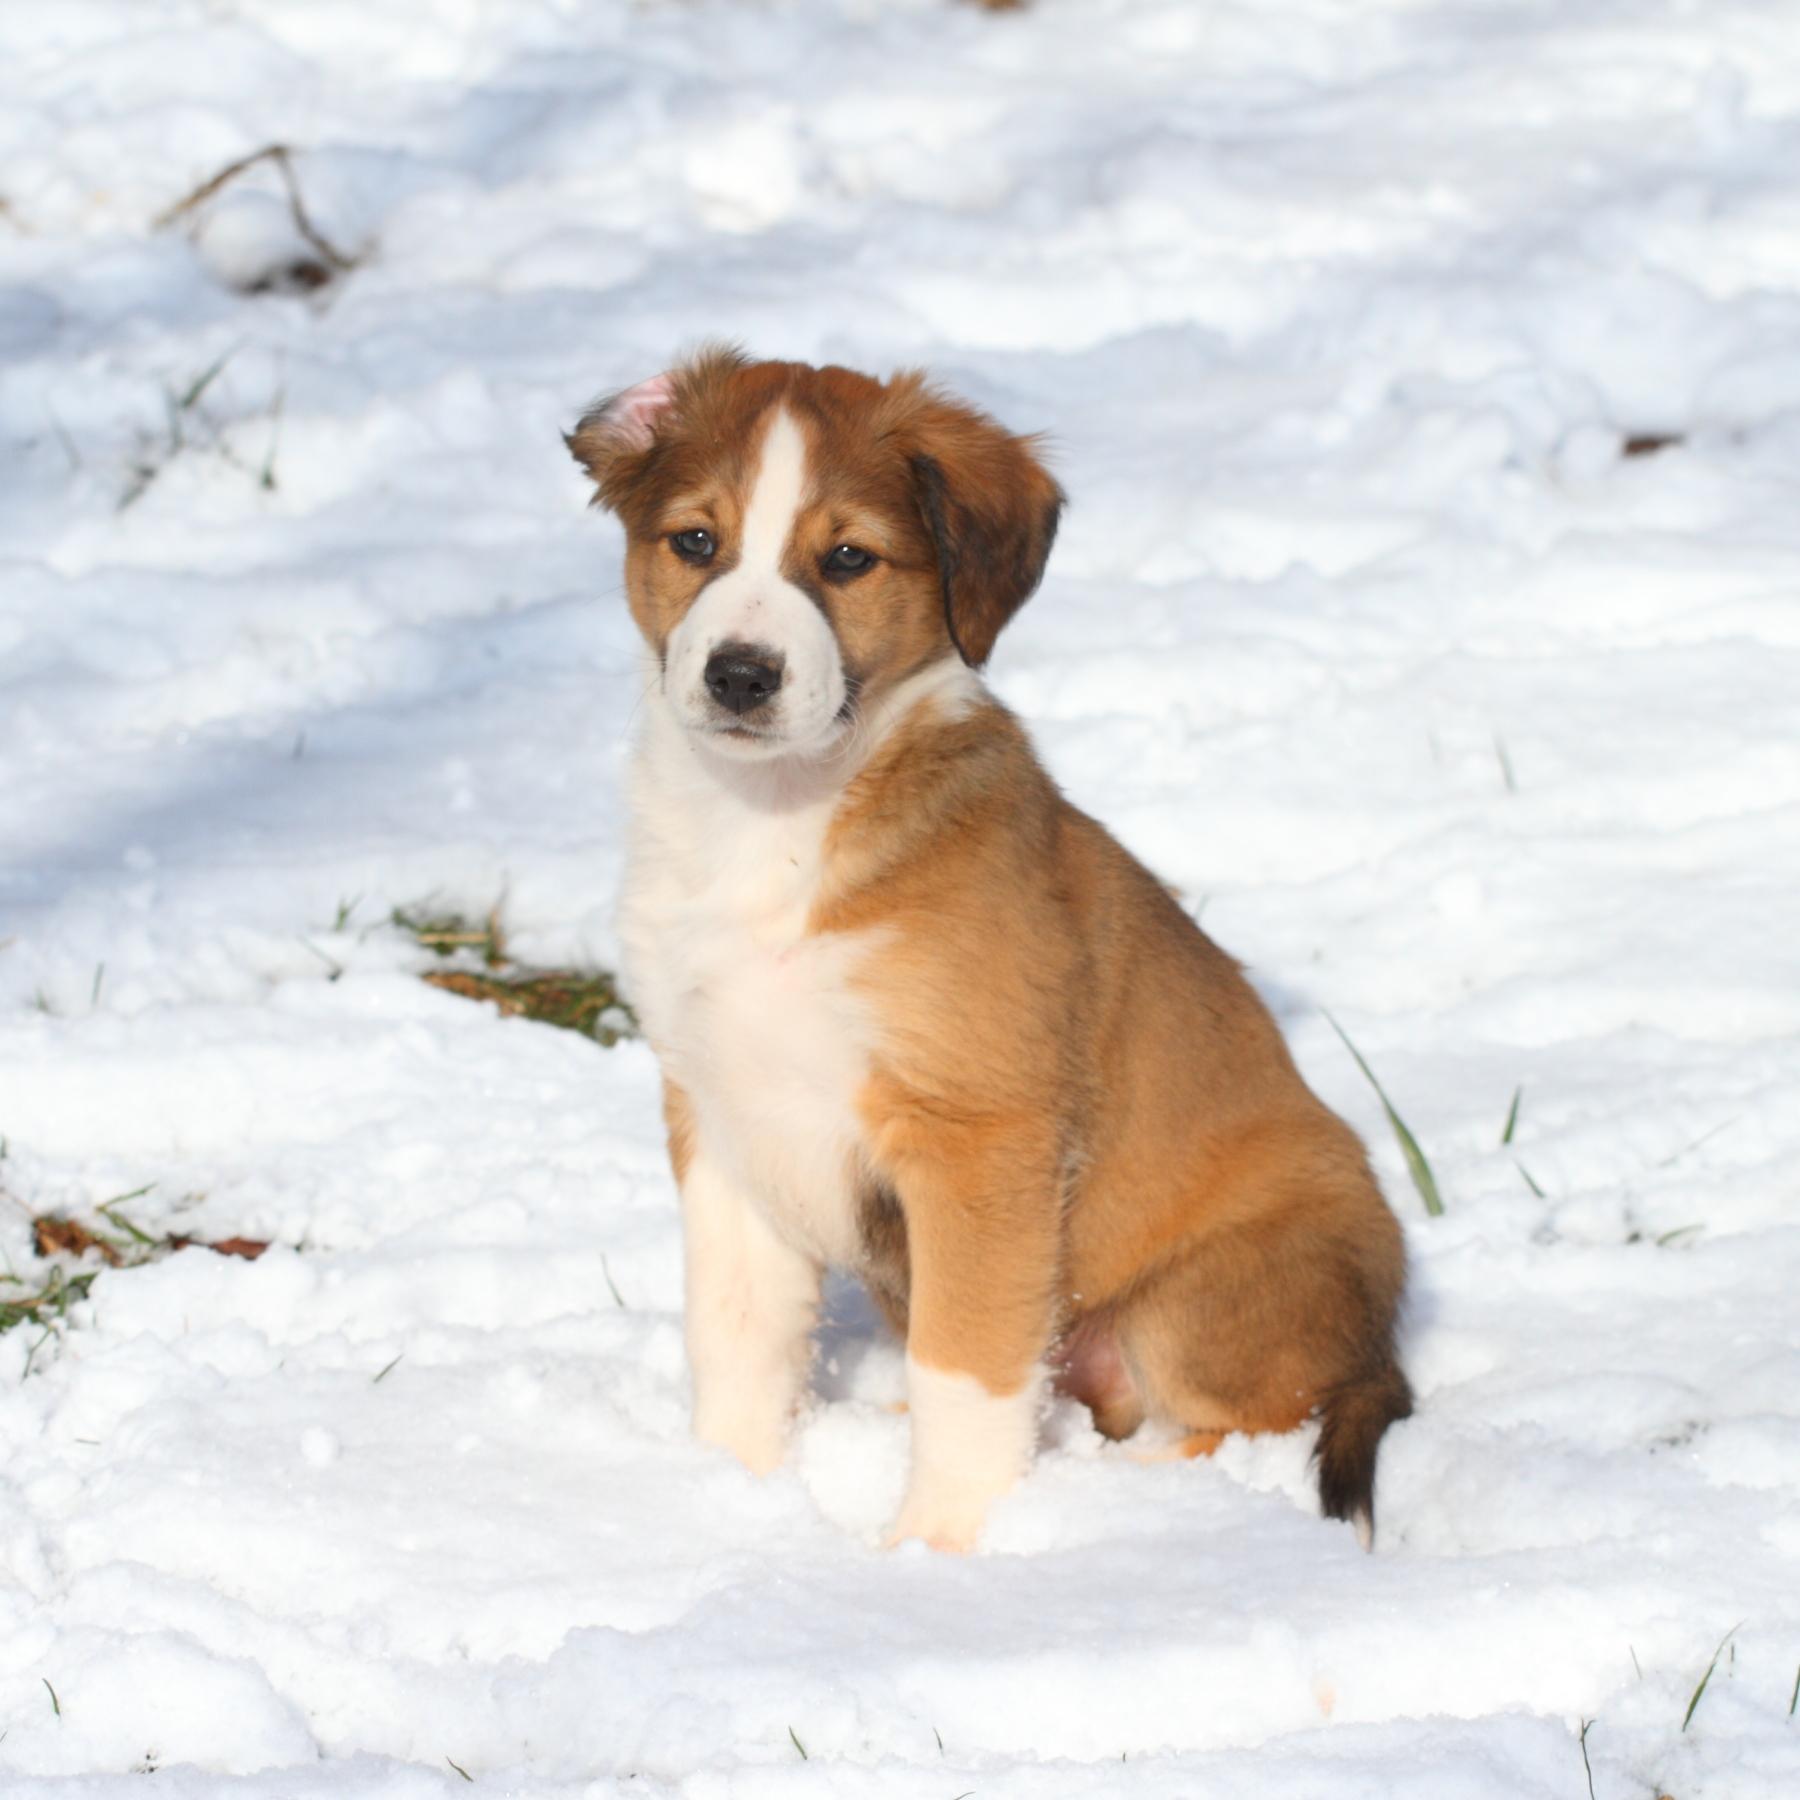 Puppy Boy #1